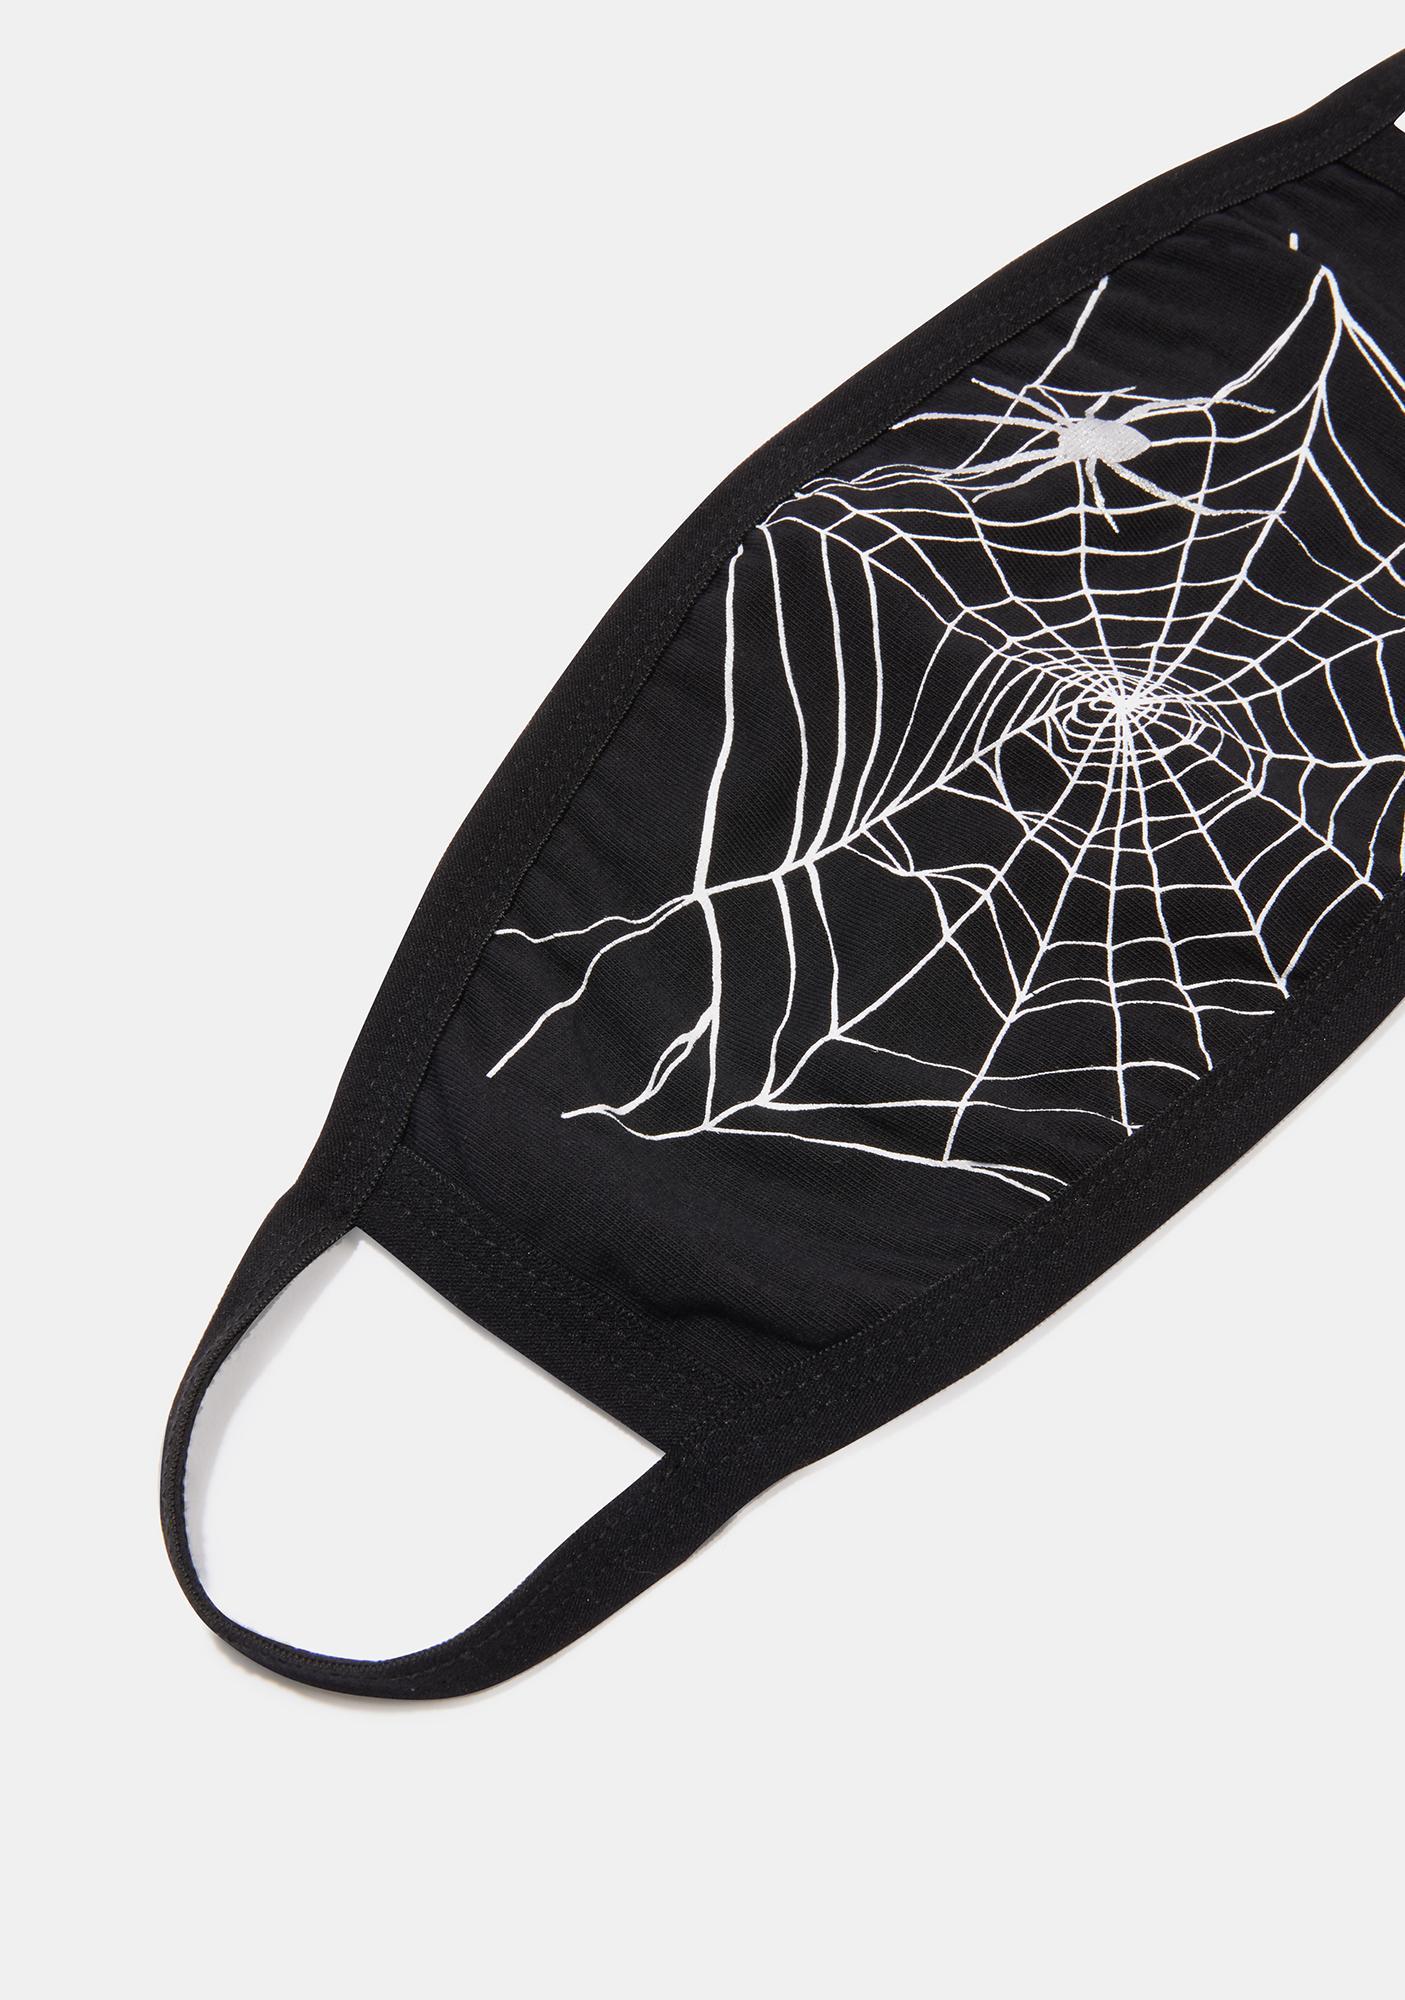 Trickz & Treatz The Web You Weave Face Mask